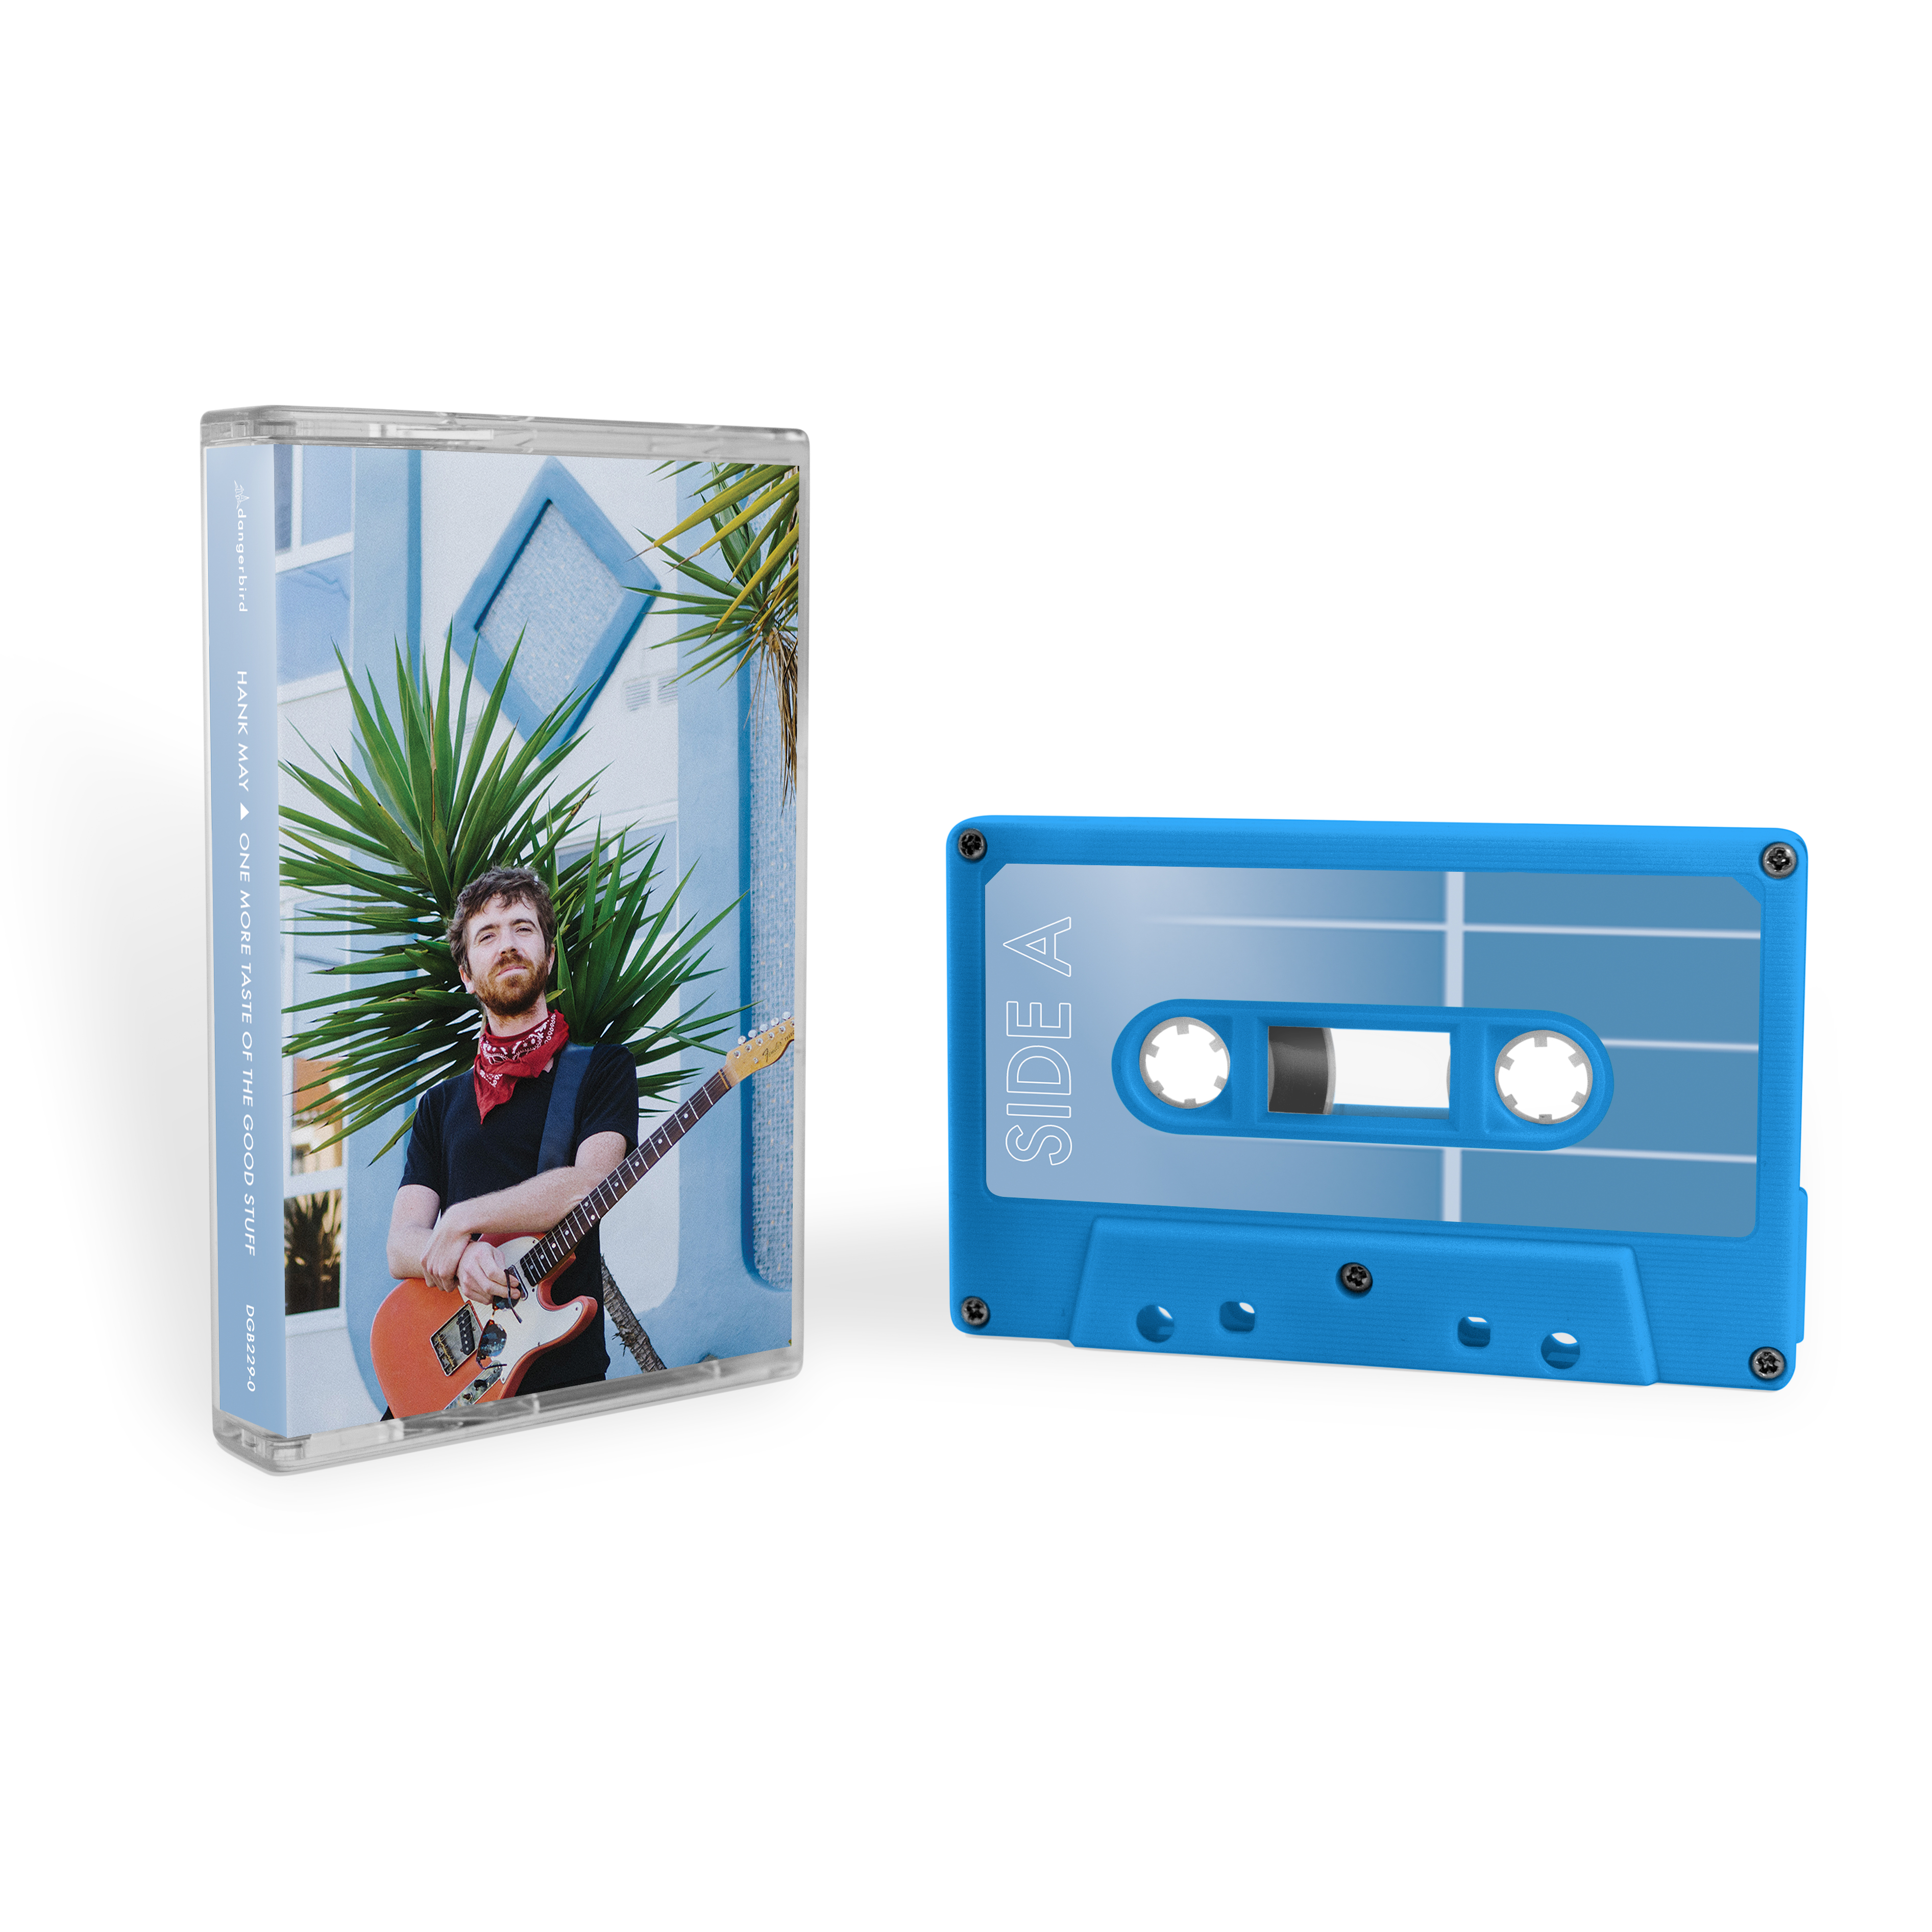 Hank May - One More Taste of the Good Stuff - Cassette Bundle